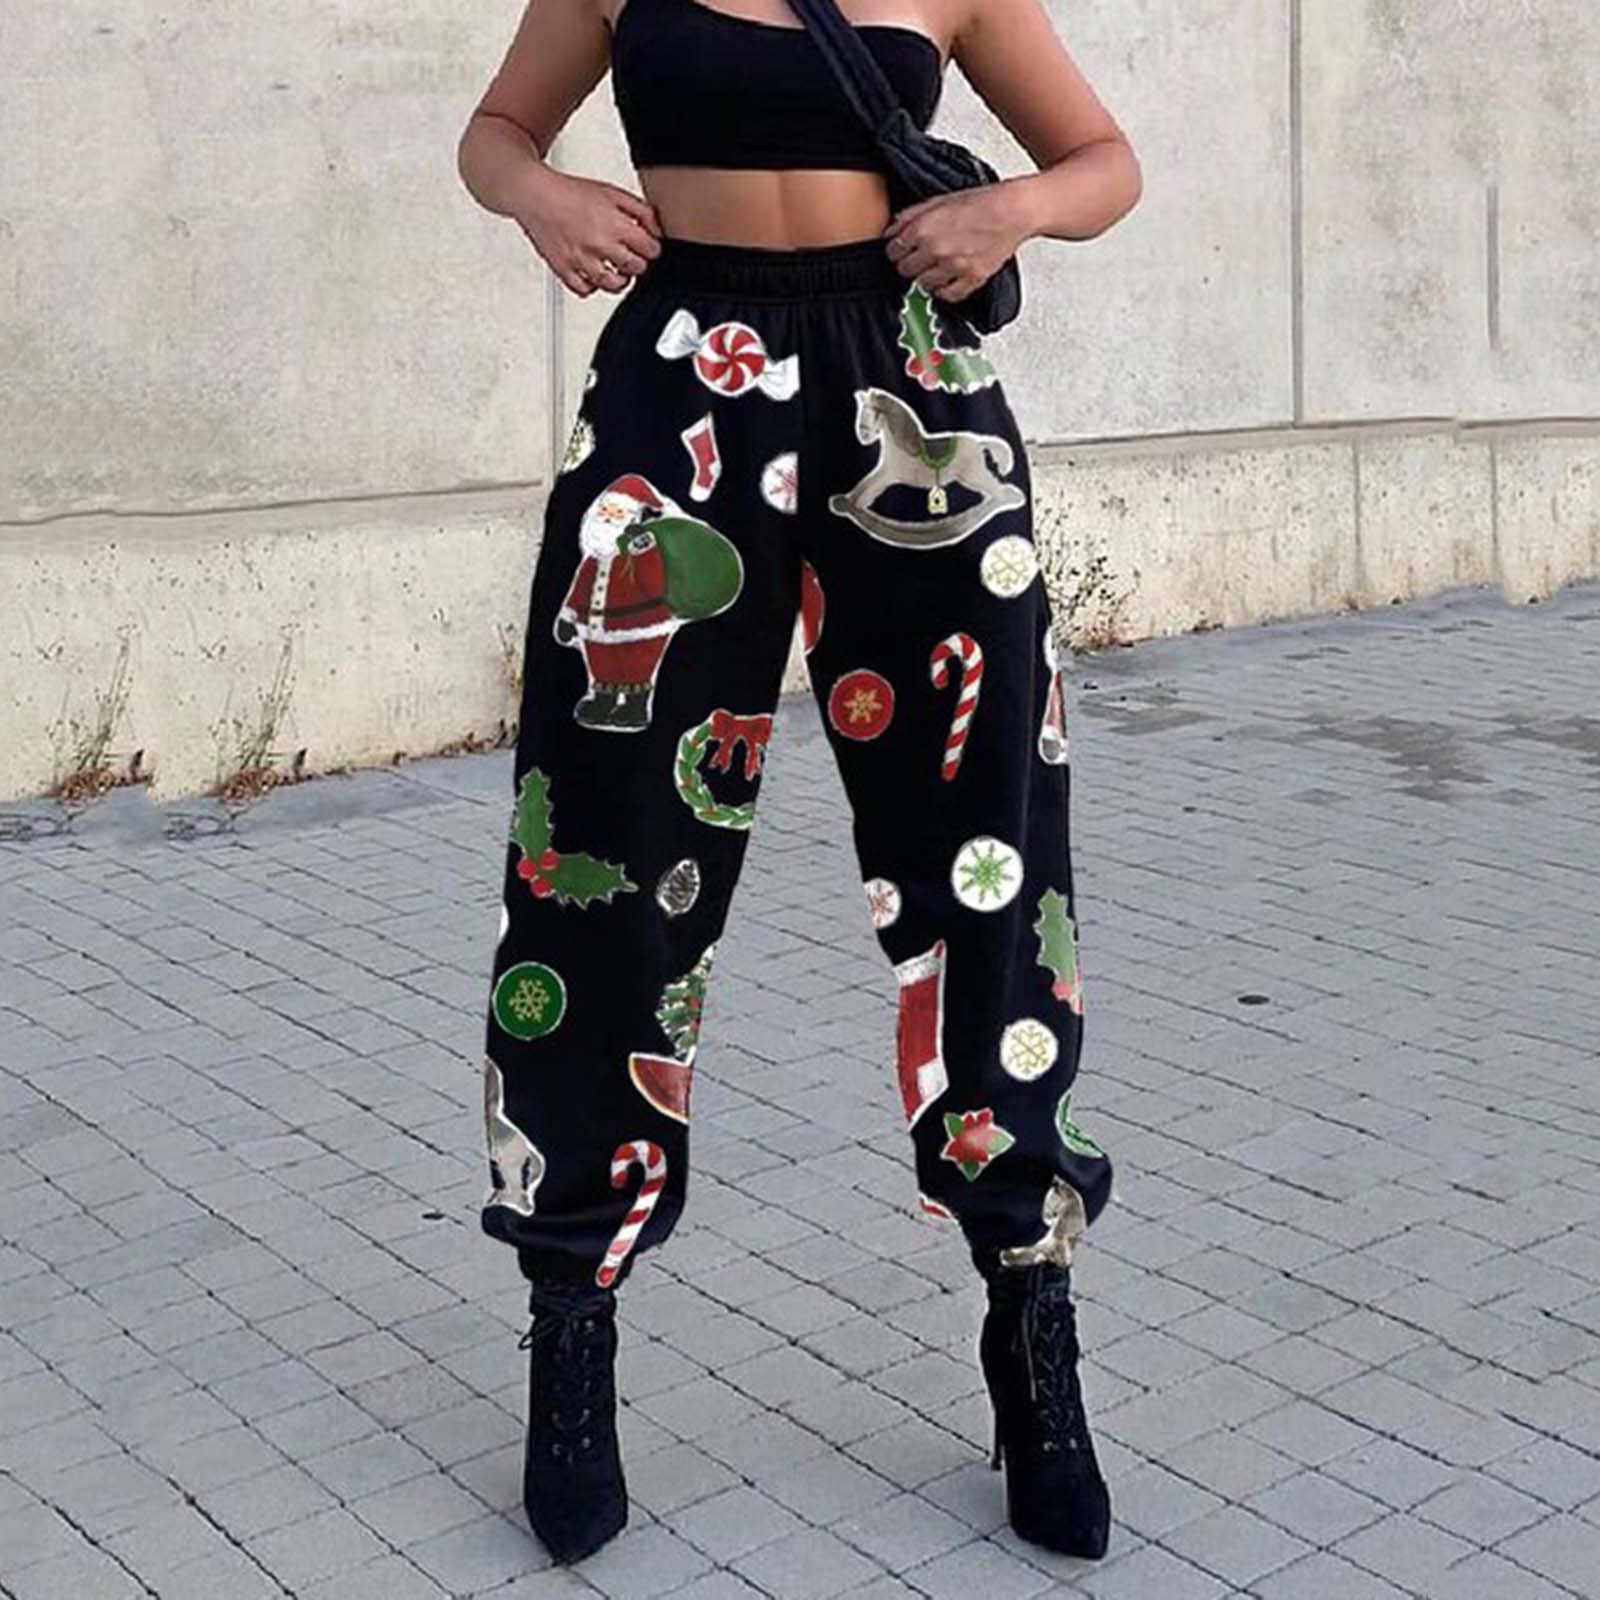 Joggers Women Christmas Treetop Print Pocket Sports Running Plus Size Athletic Pants Pantalones De Mujer Pantalon Femme Pants Capris Aliexpress